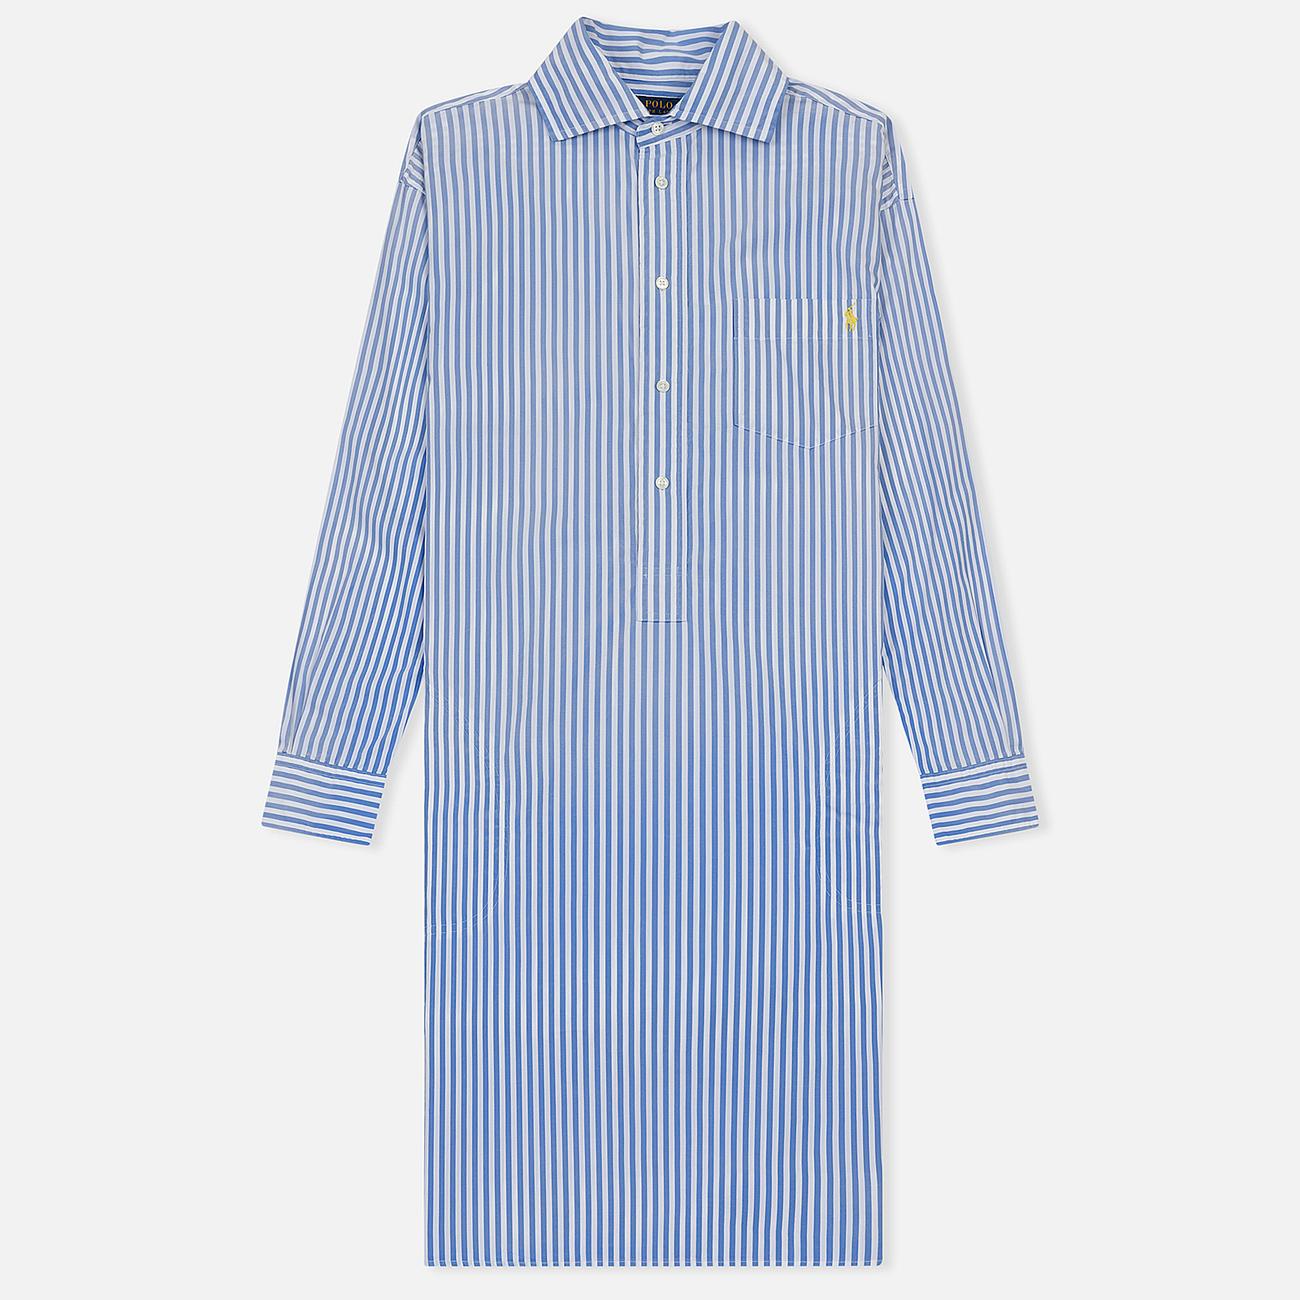 Женское платье Polo Ralph Lauren Chigo LS Sunfade Stripe Blue/White